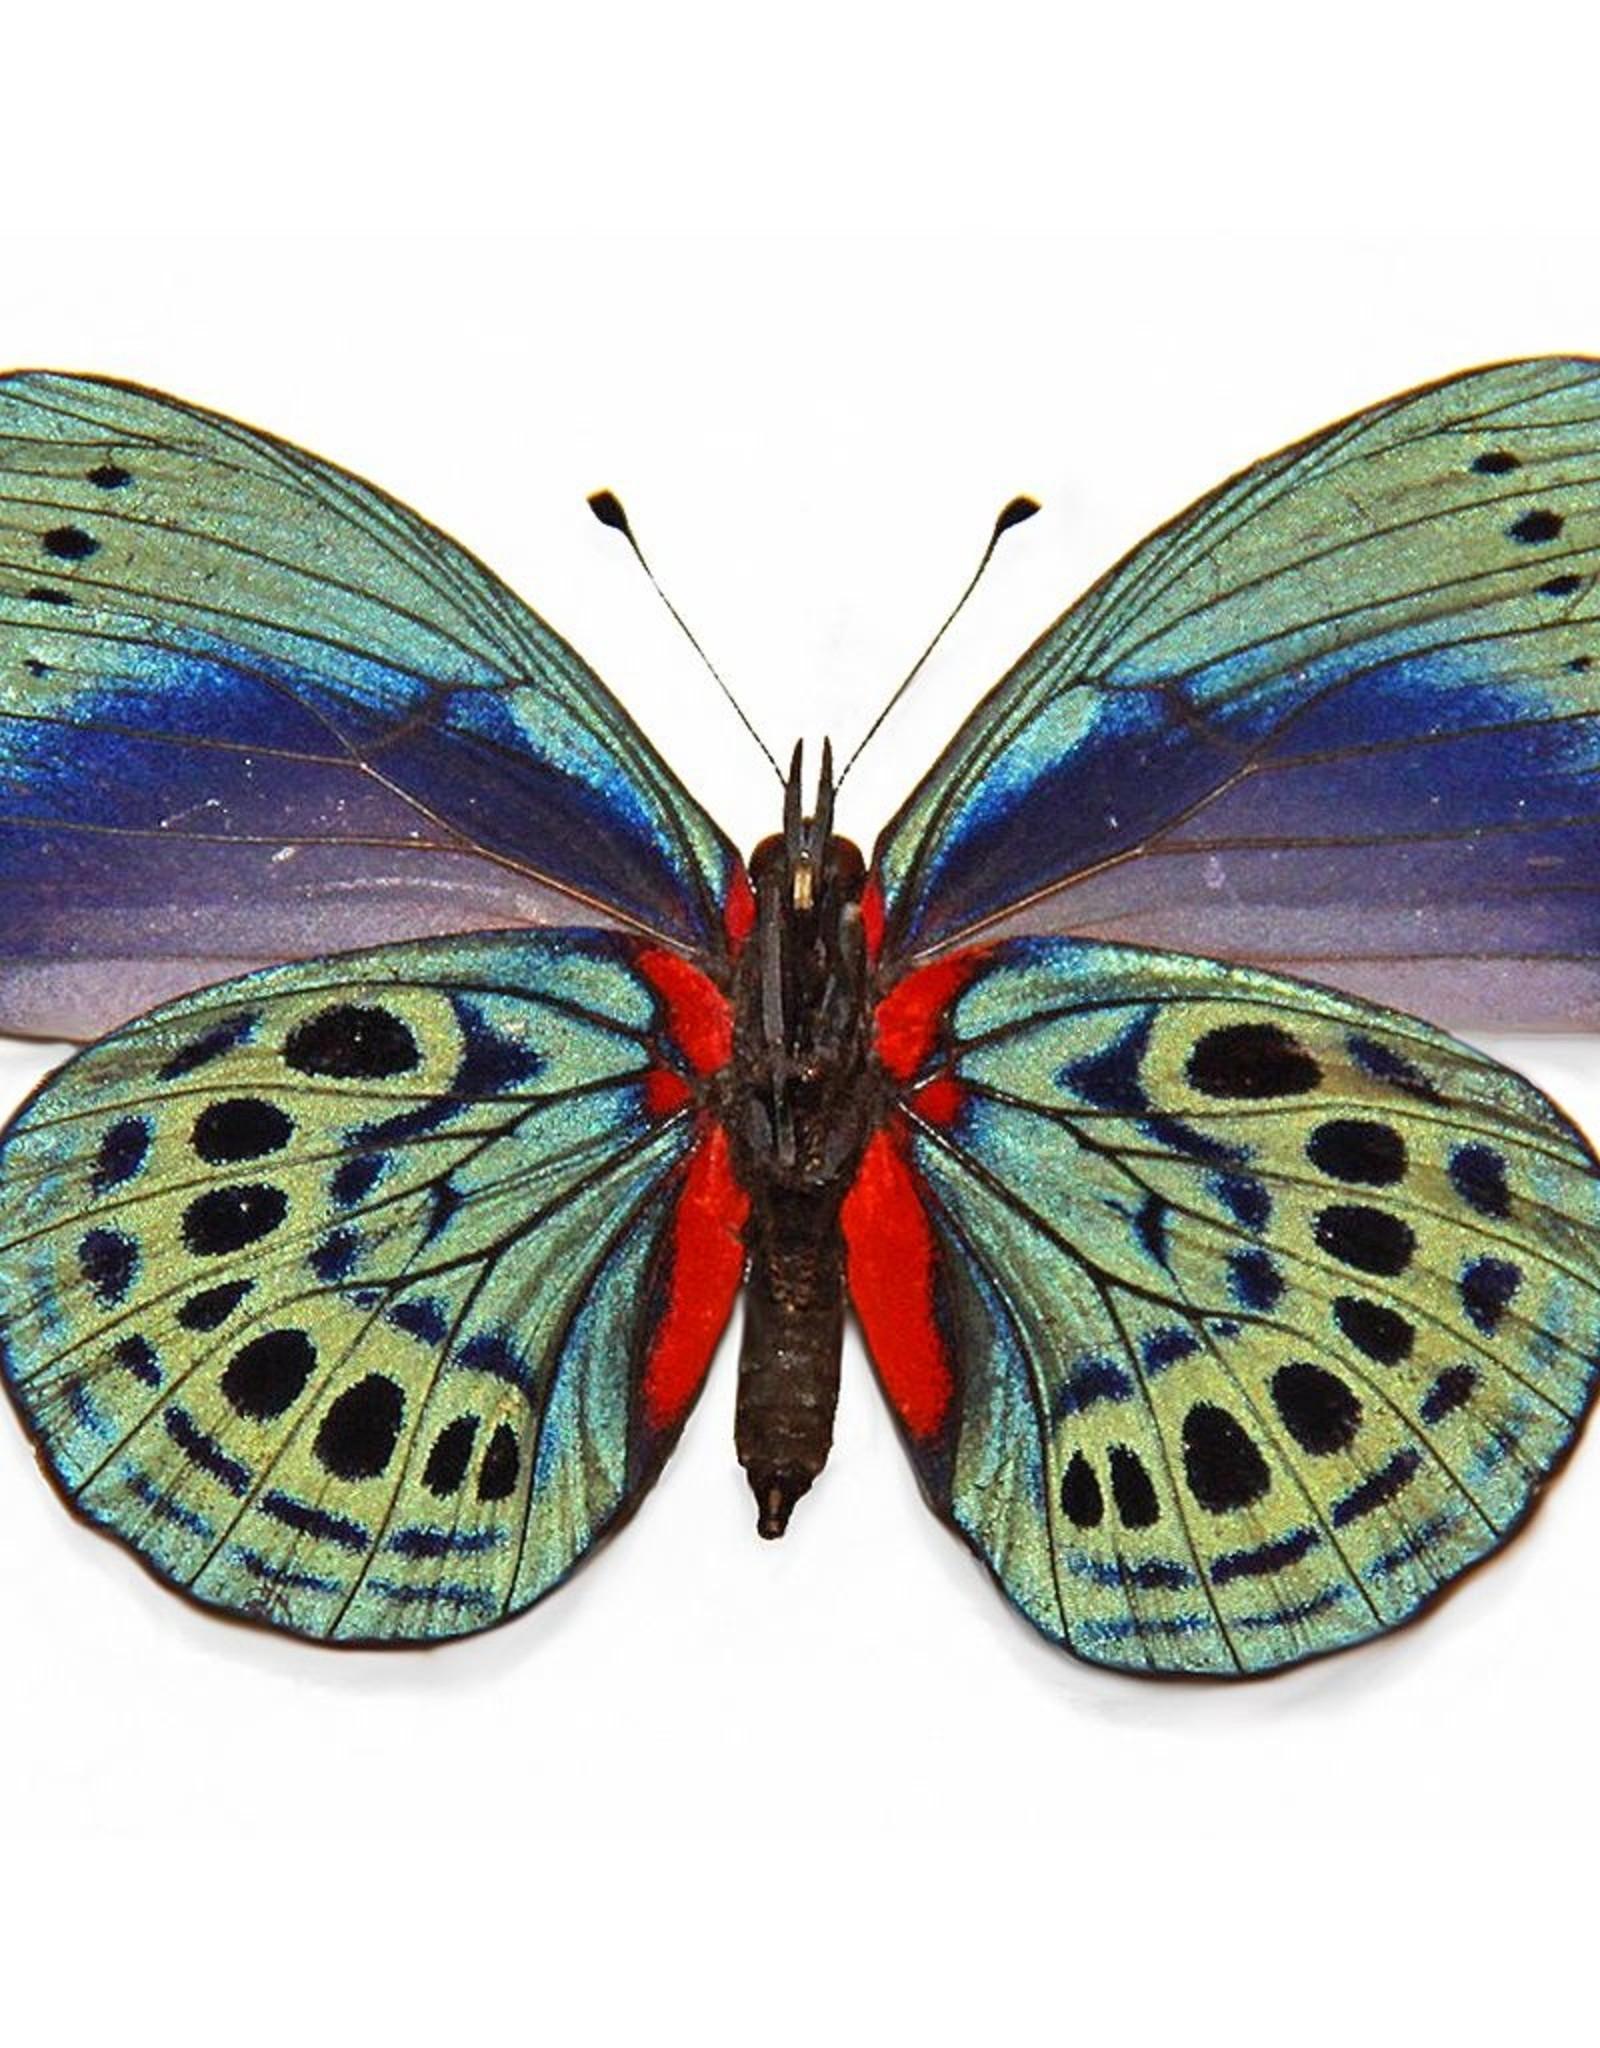 Asterope leprieuri philotina ( = A. optima philotina) M A1 Peru